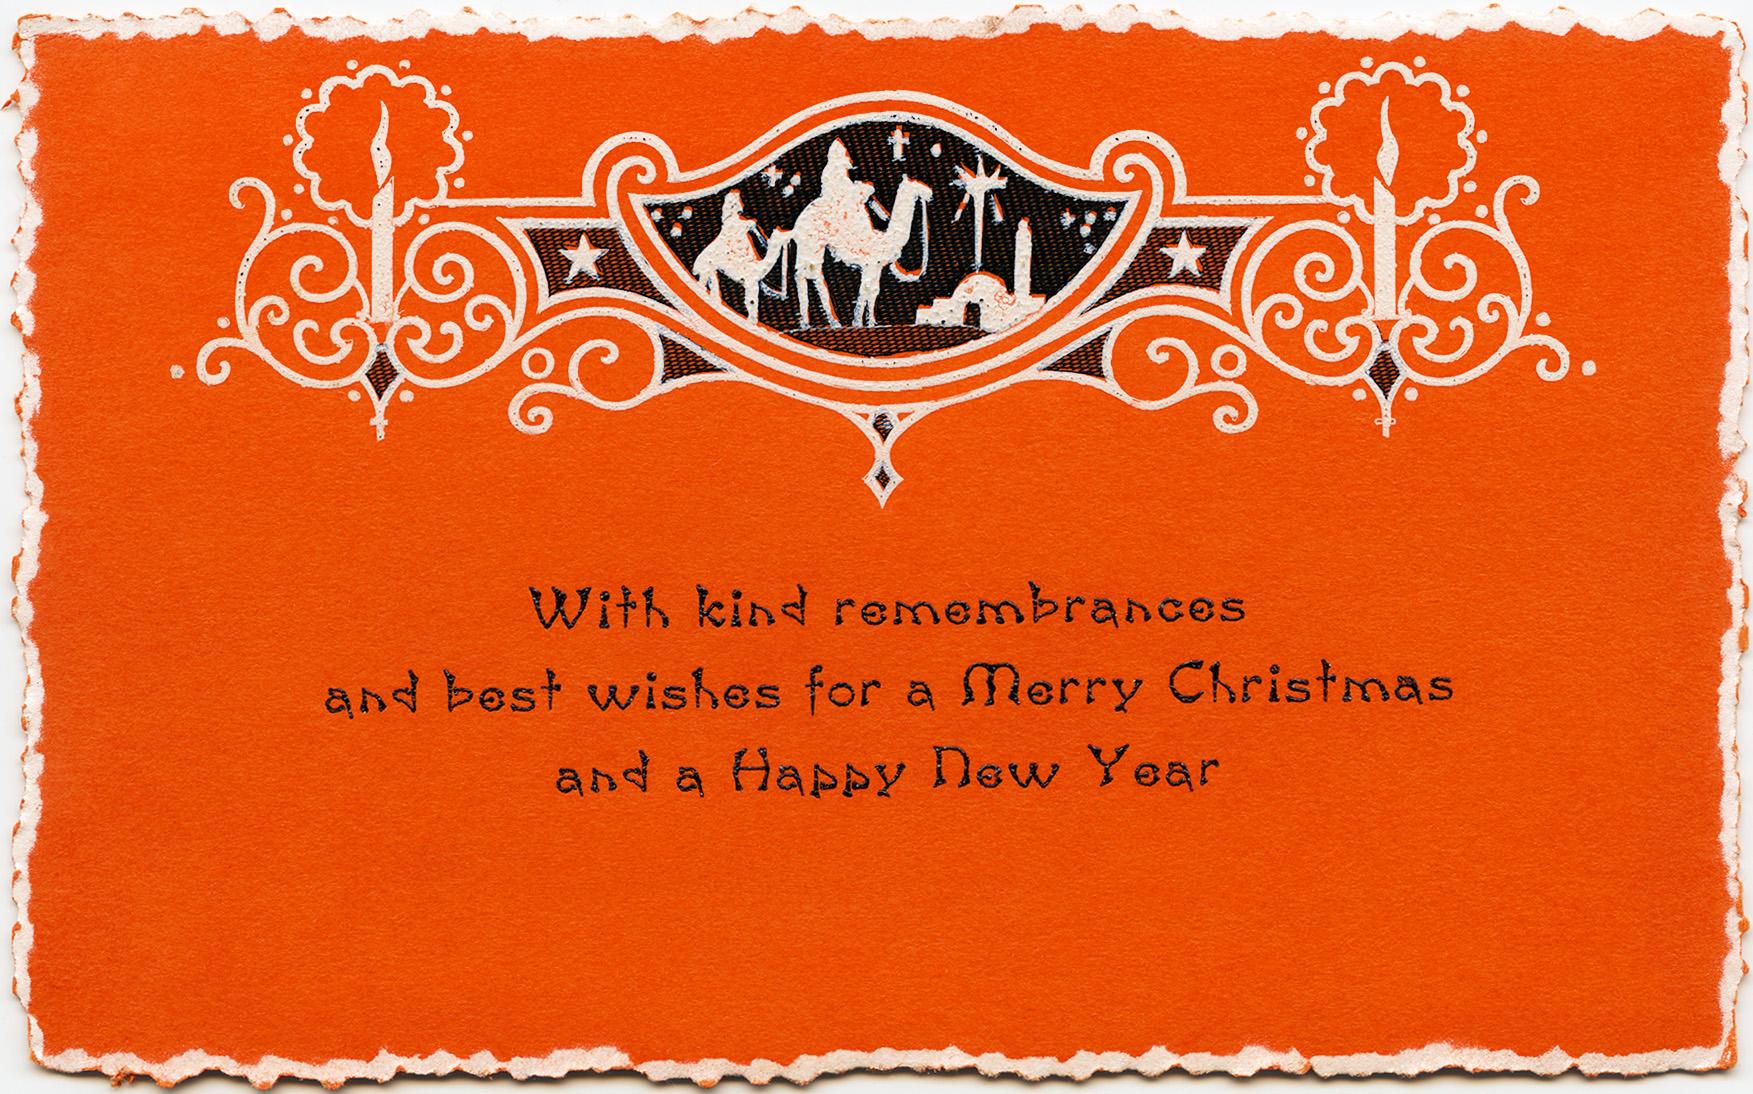 Free Vintage Orange Christmas Greeting Card Graphic